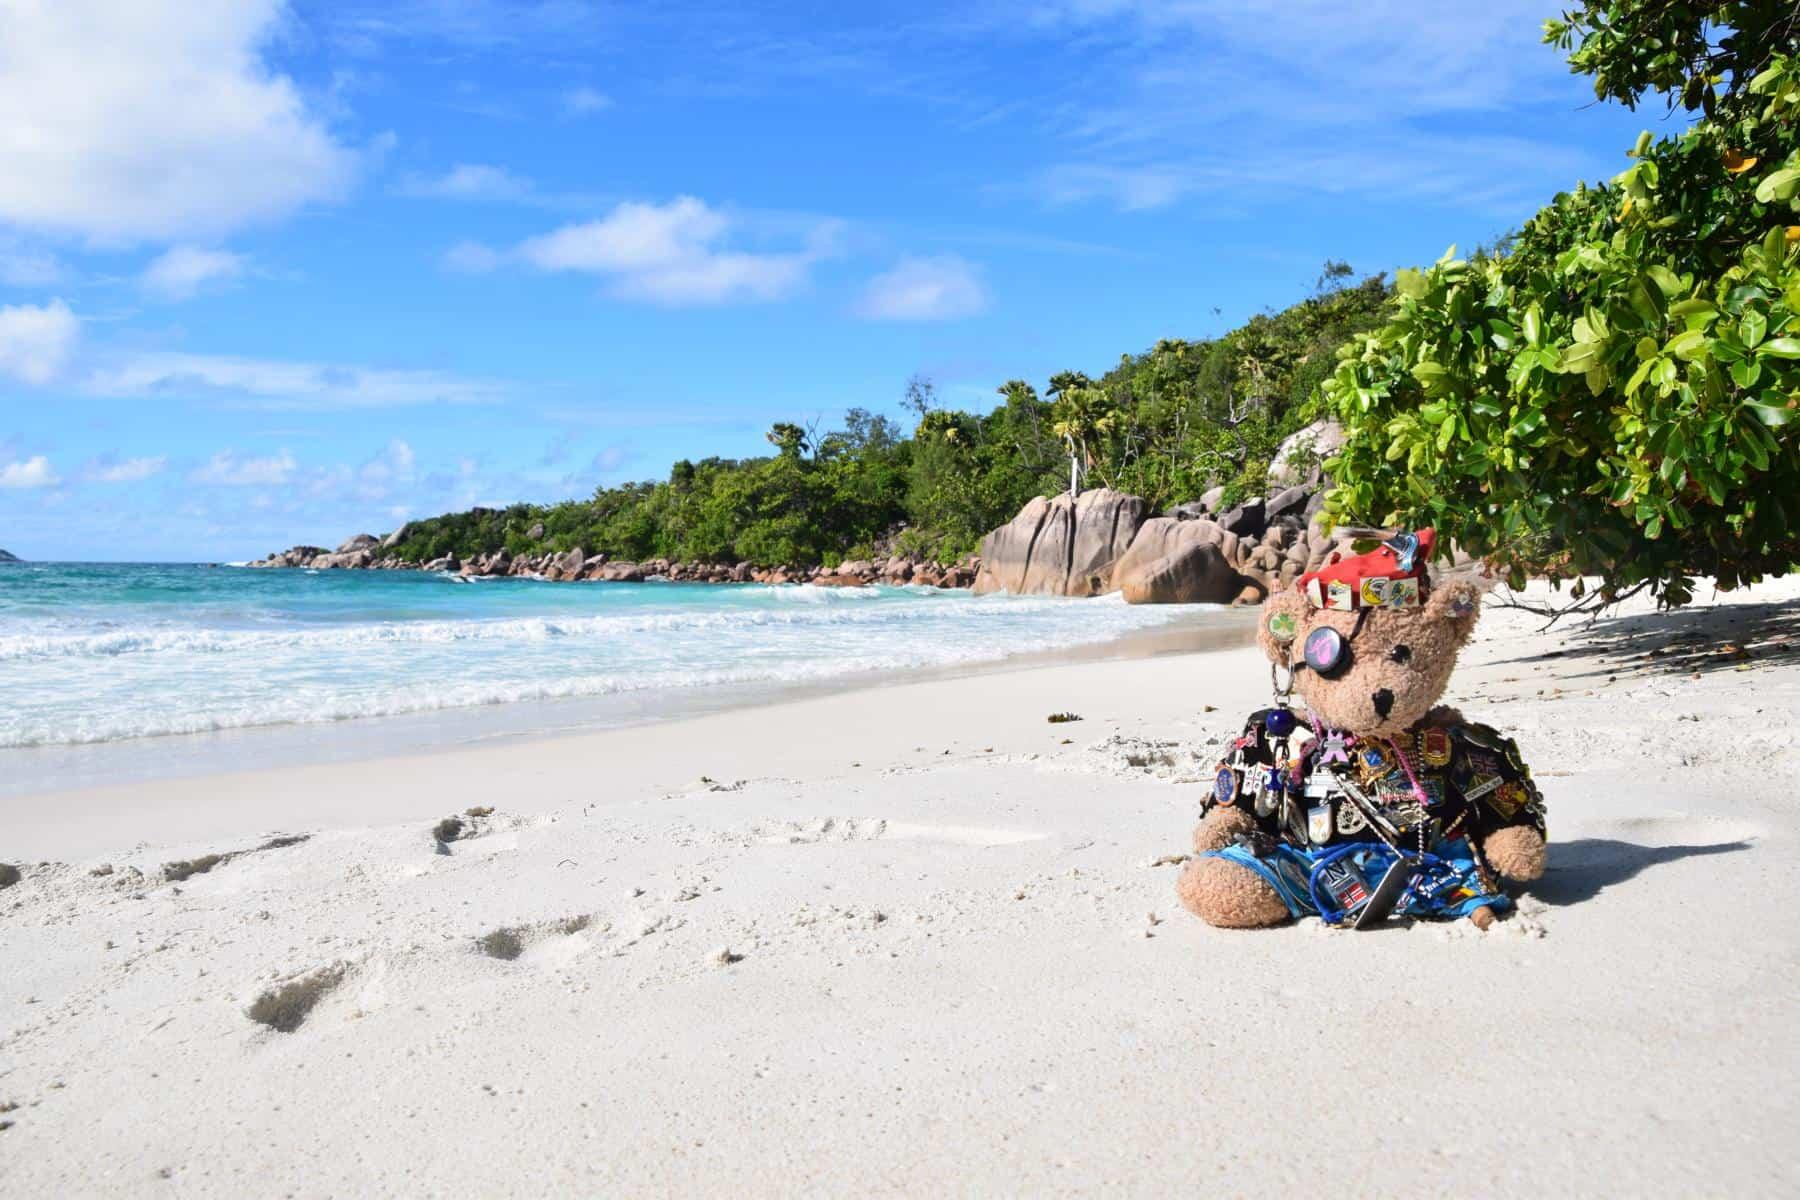 Reiseblog fernwehblog Traumstrand Anse Lazio Praslin Islandhopping Seychellen